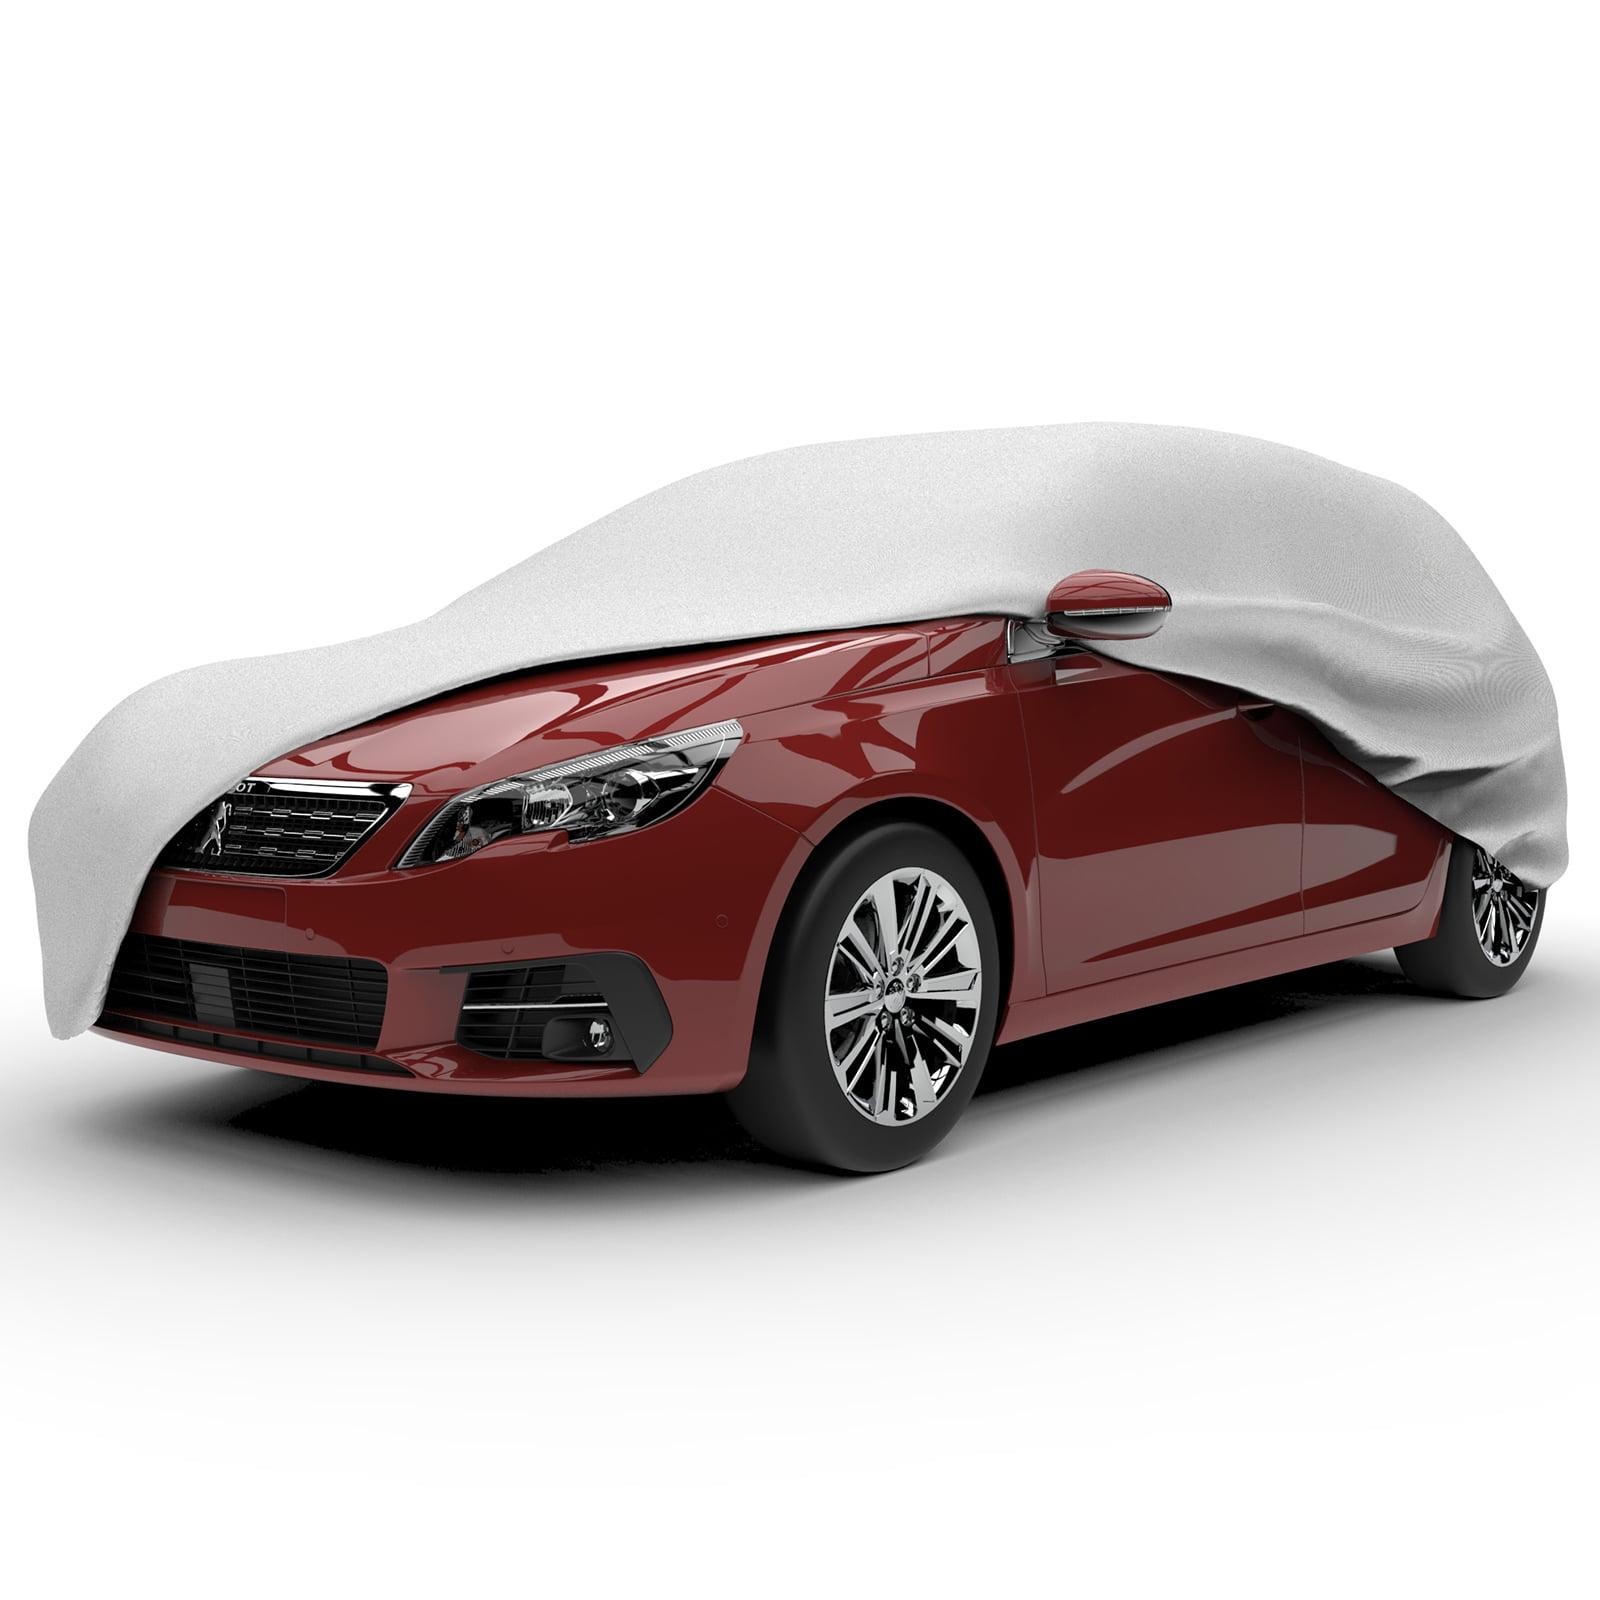 Budge Protector V Hatchback Car Cover, Waterproof Outdoor